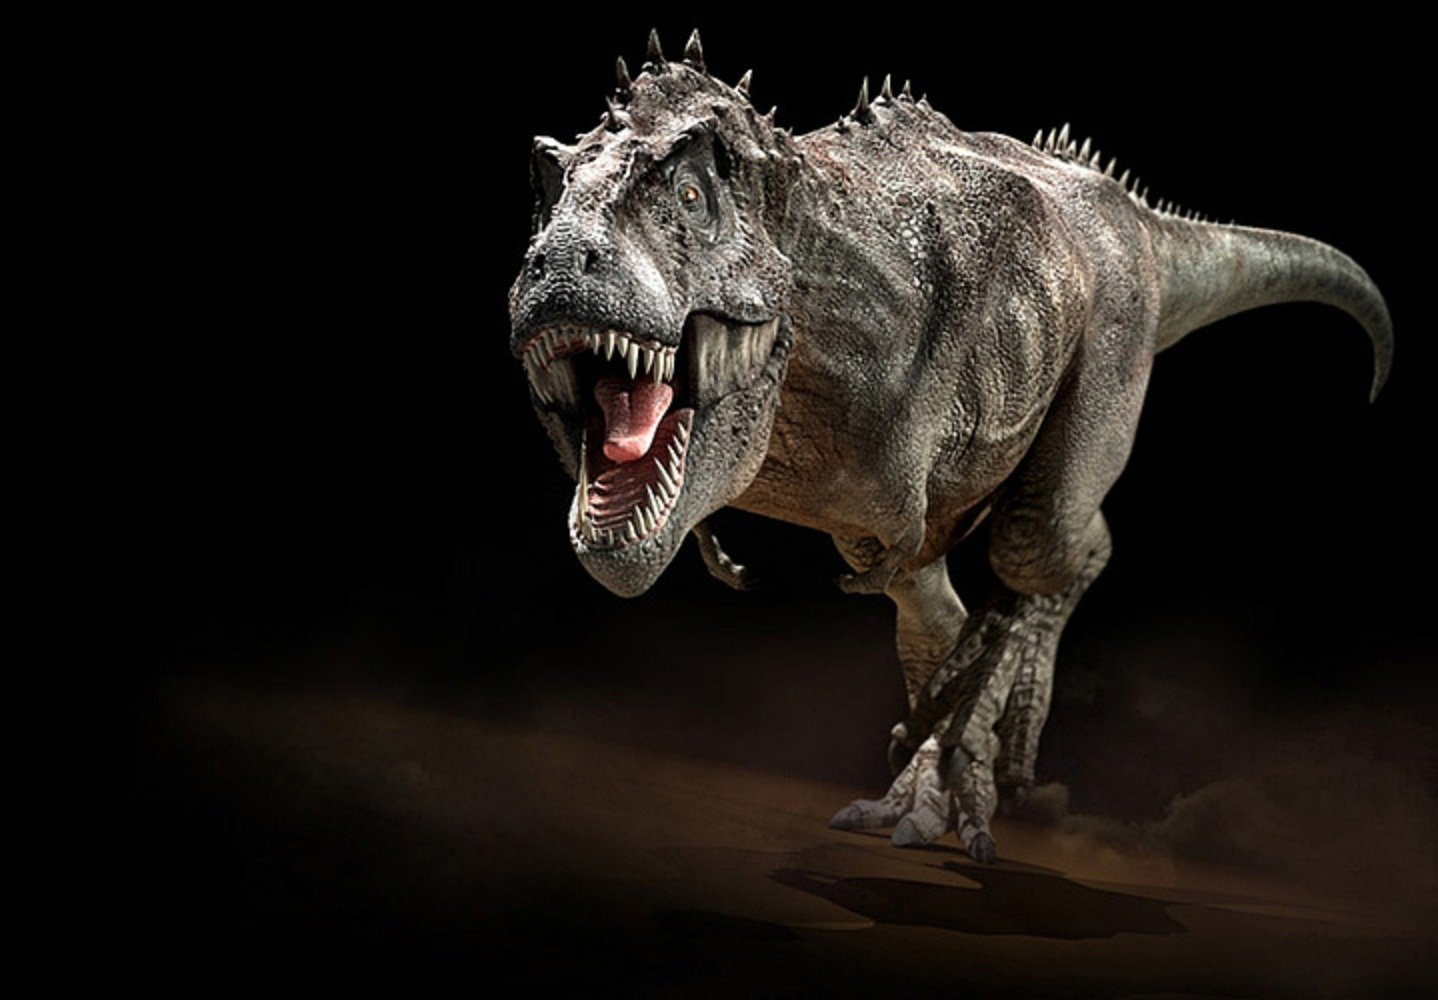 Tyrannosaurus rex wallpaper wallpapersafari for Tyranosaurus rex